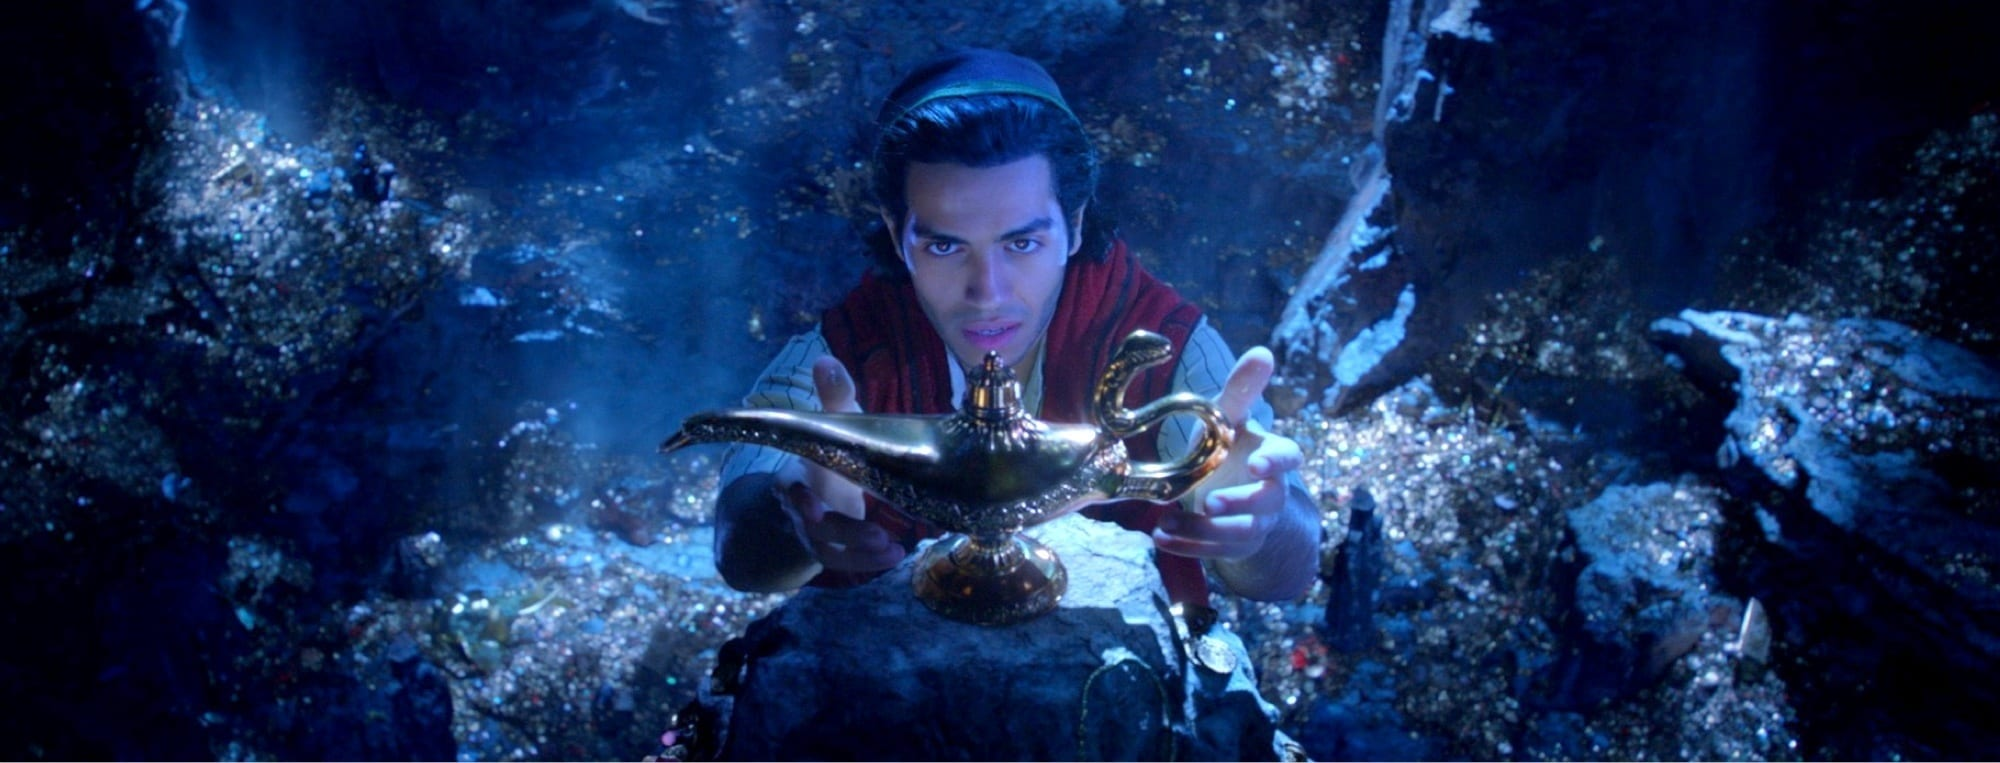 Aladdin – minden, amit eddig tudunk